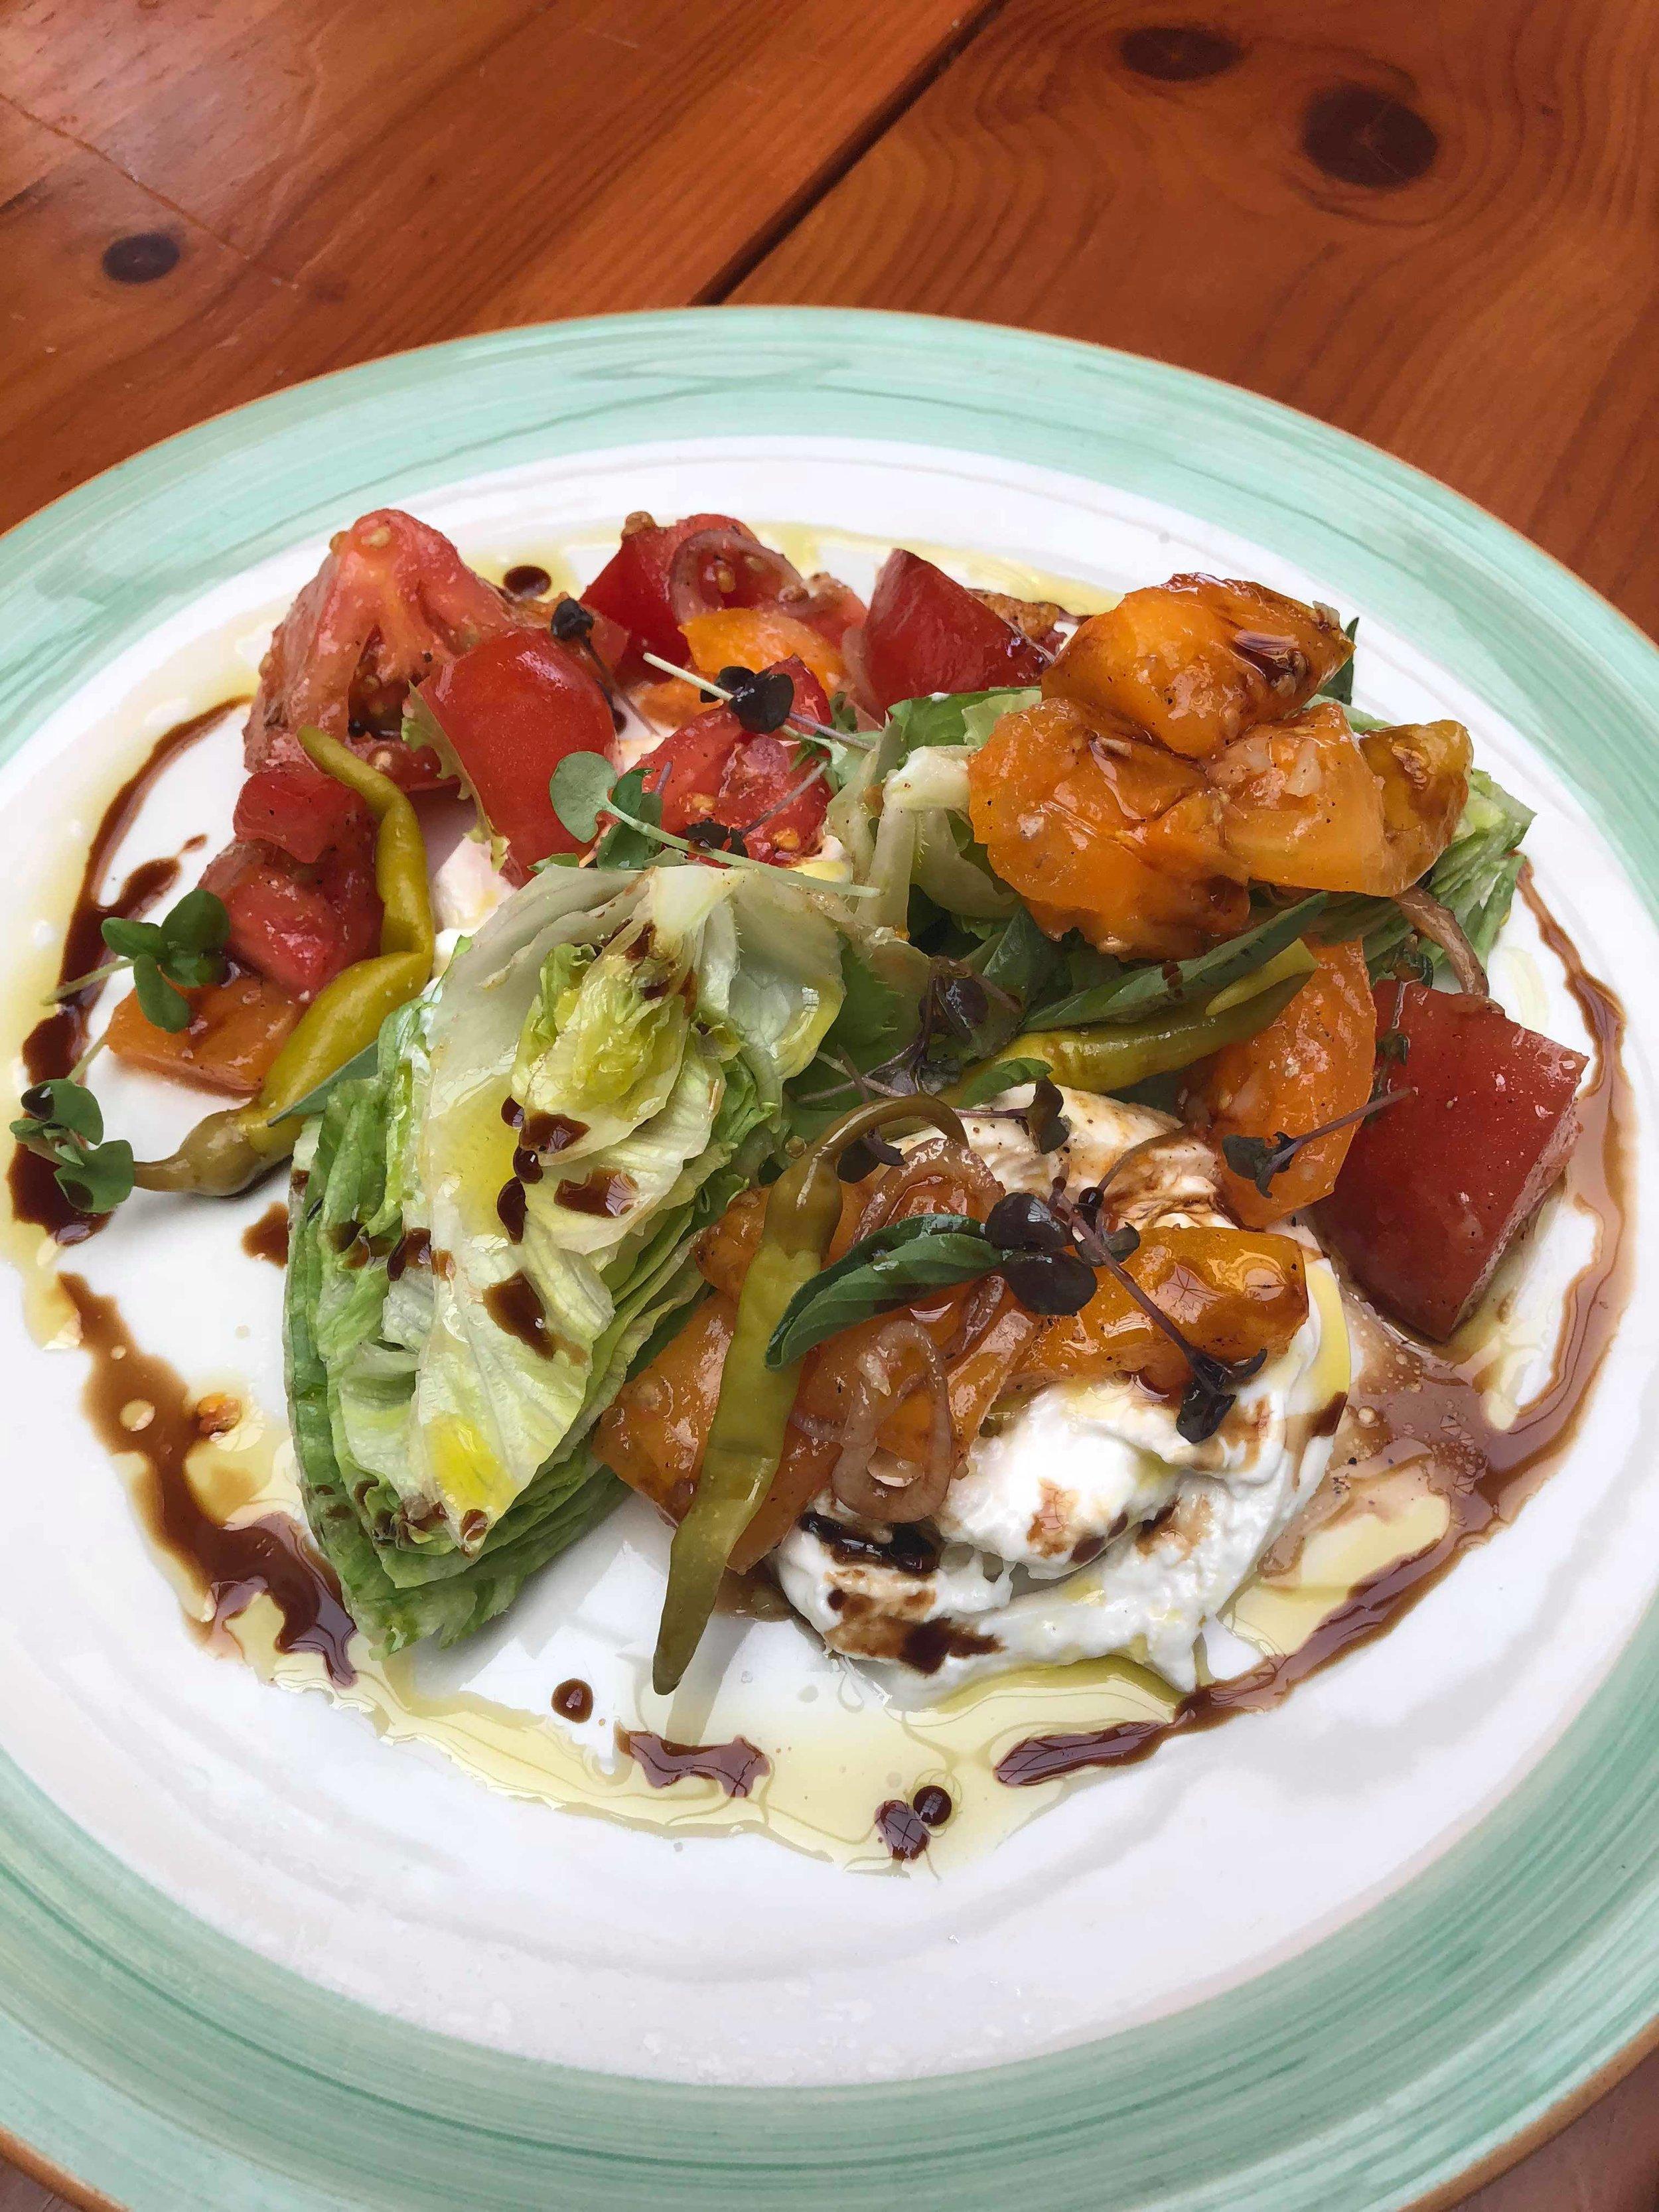 Burrata: heirloom tomato, sweet onion, basil, aged balsamic, olive oil